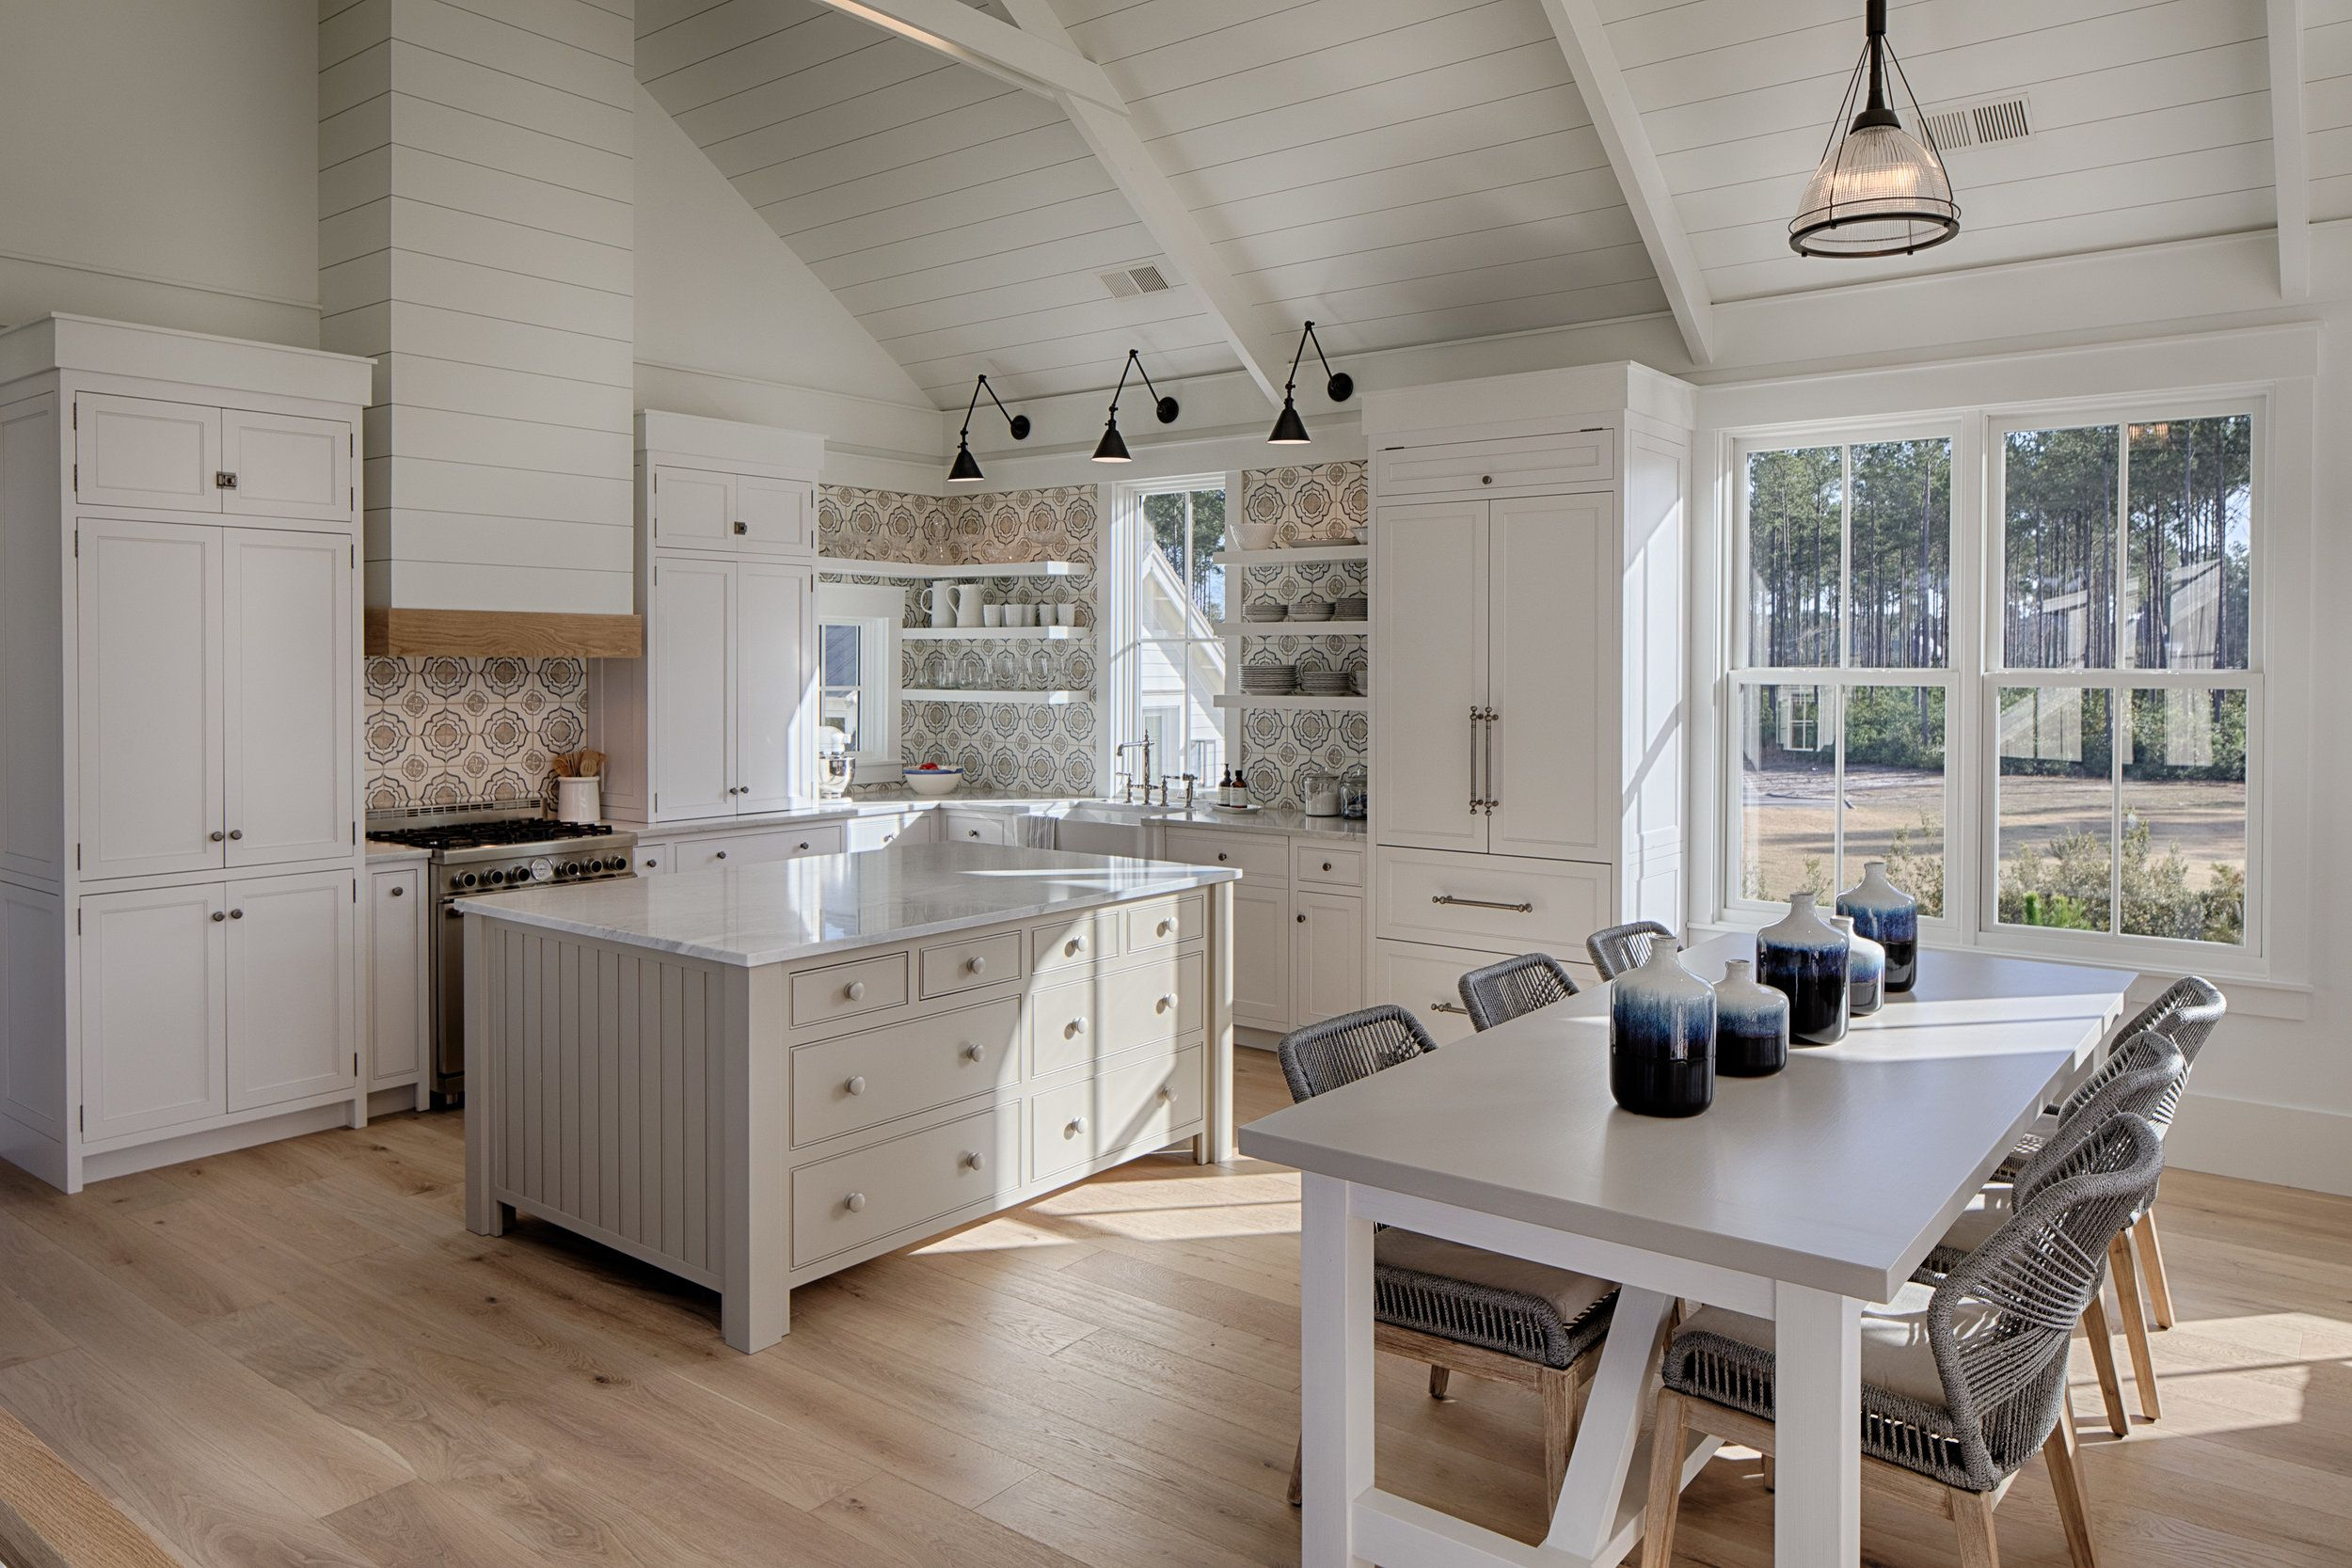 Coastal Cottage Interior Design Inspiration - Part 1 {Get ...